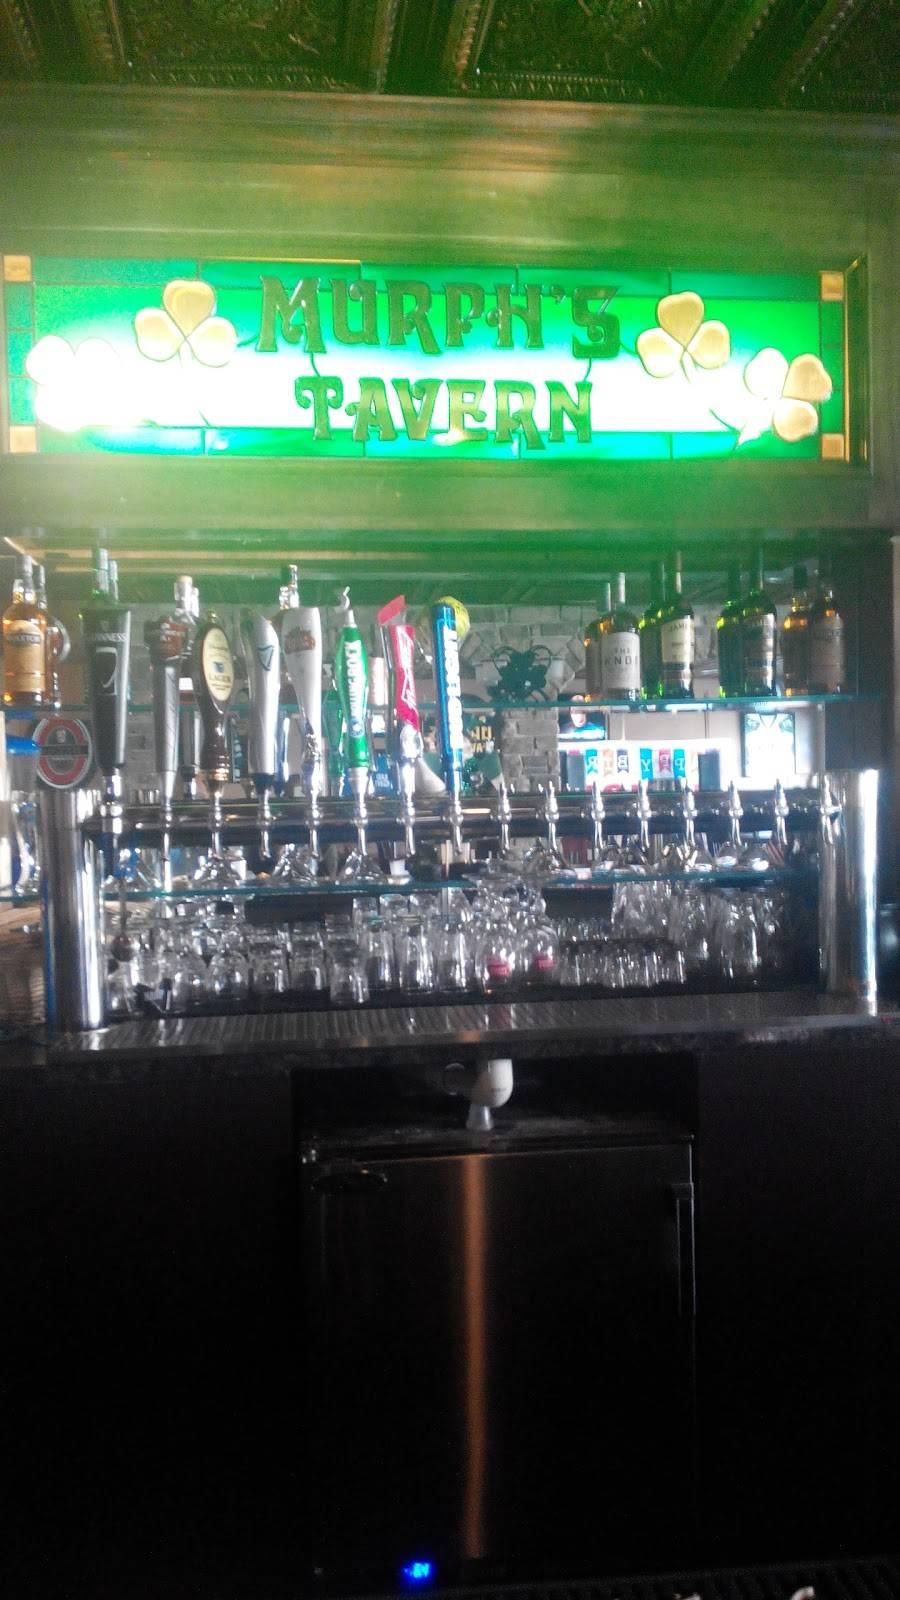 Murphs Tavern   restaurant   375 Union Blvd, Totowa, NJ 07512, USA   9735955756 OR +1 973-595-5756